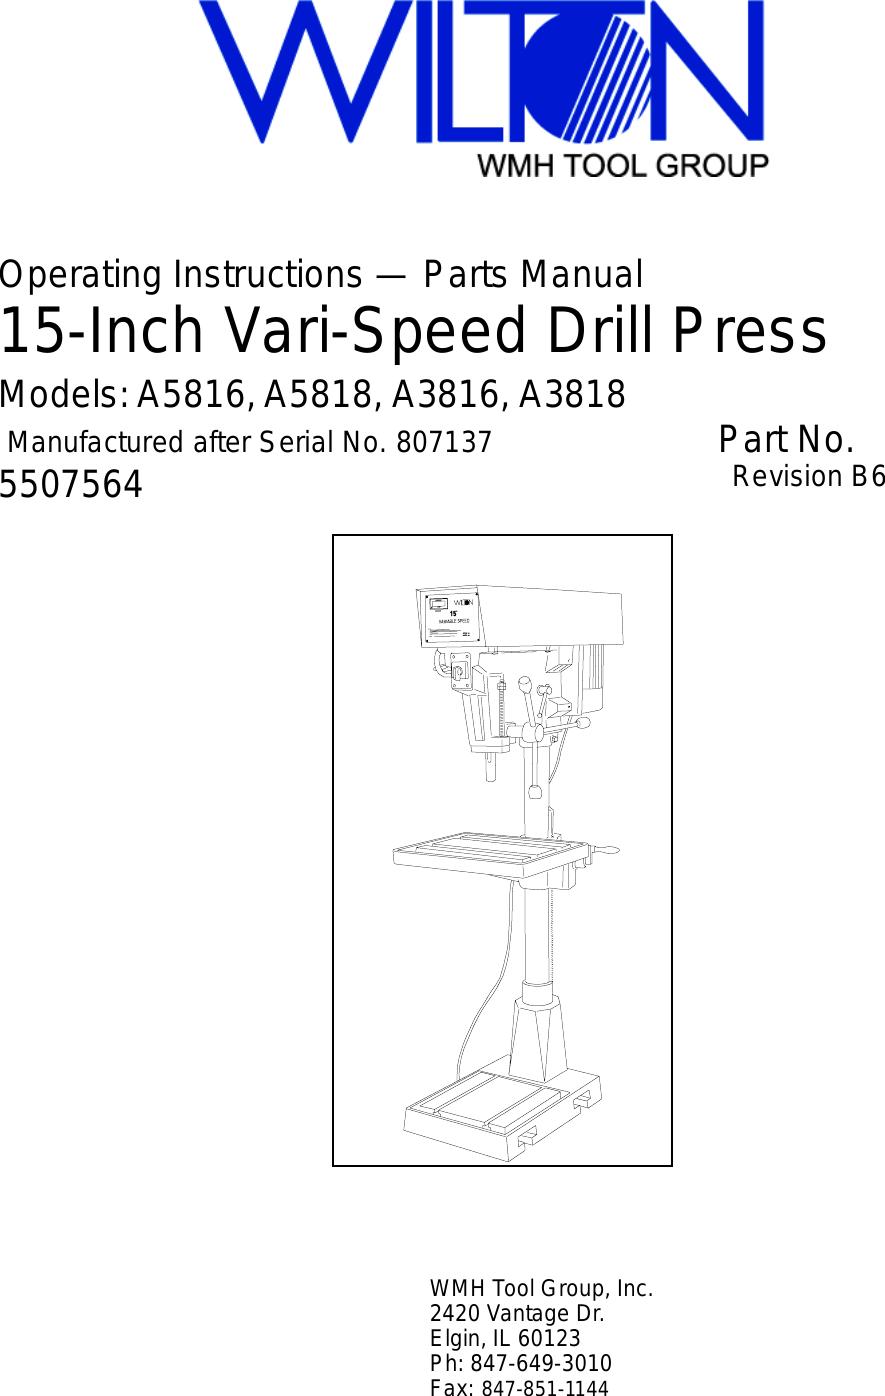 Wilton A3816 Users Manual A5816 Rev B6 Vise Parts Diagram